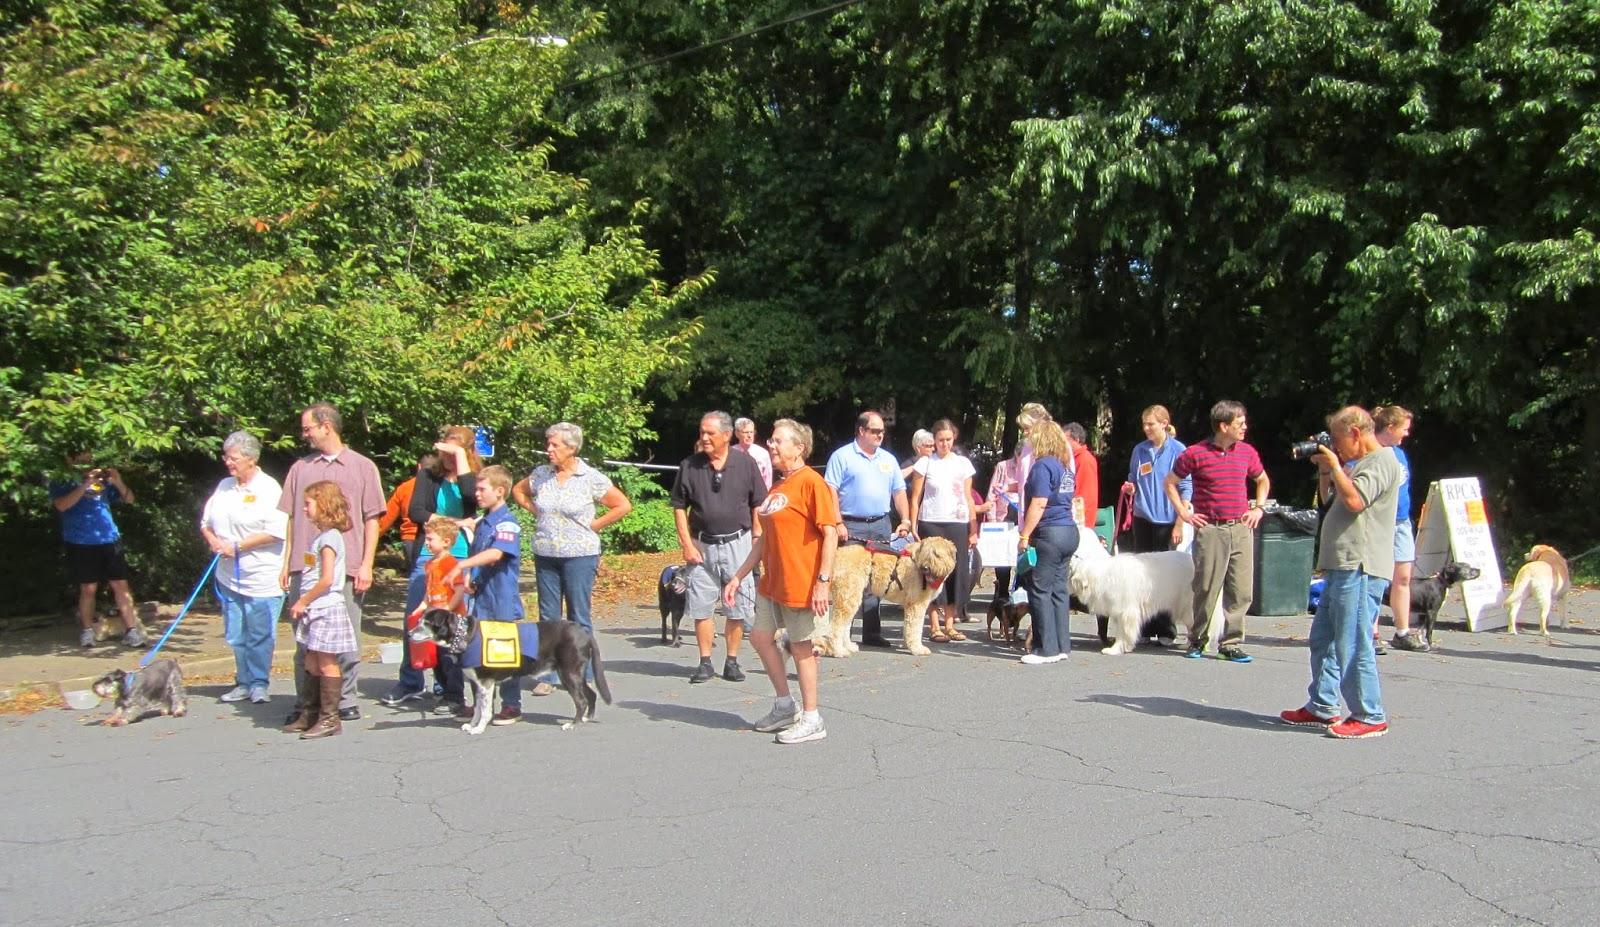 how to plan a fundraiser walk